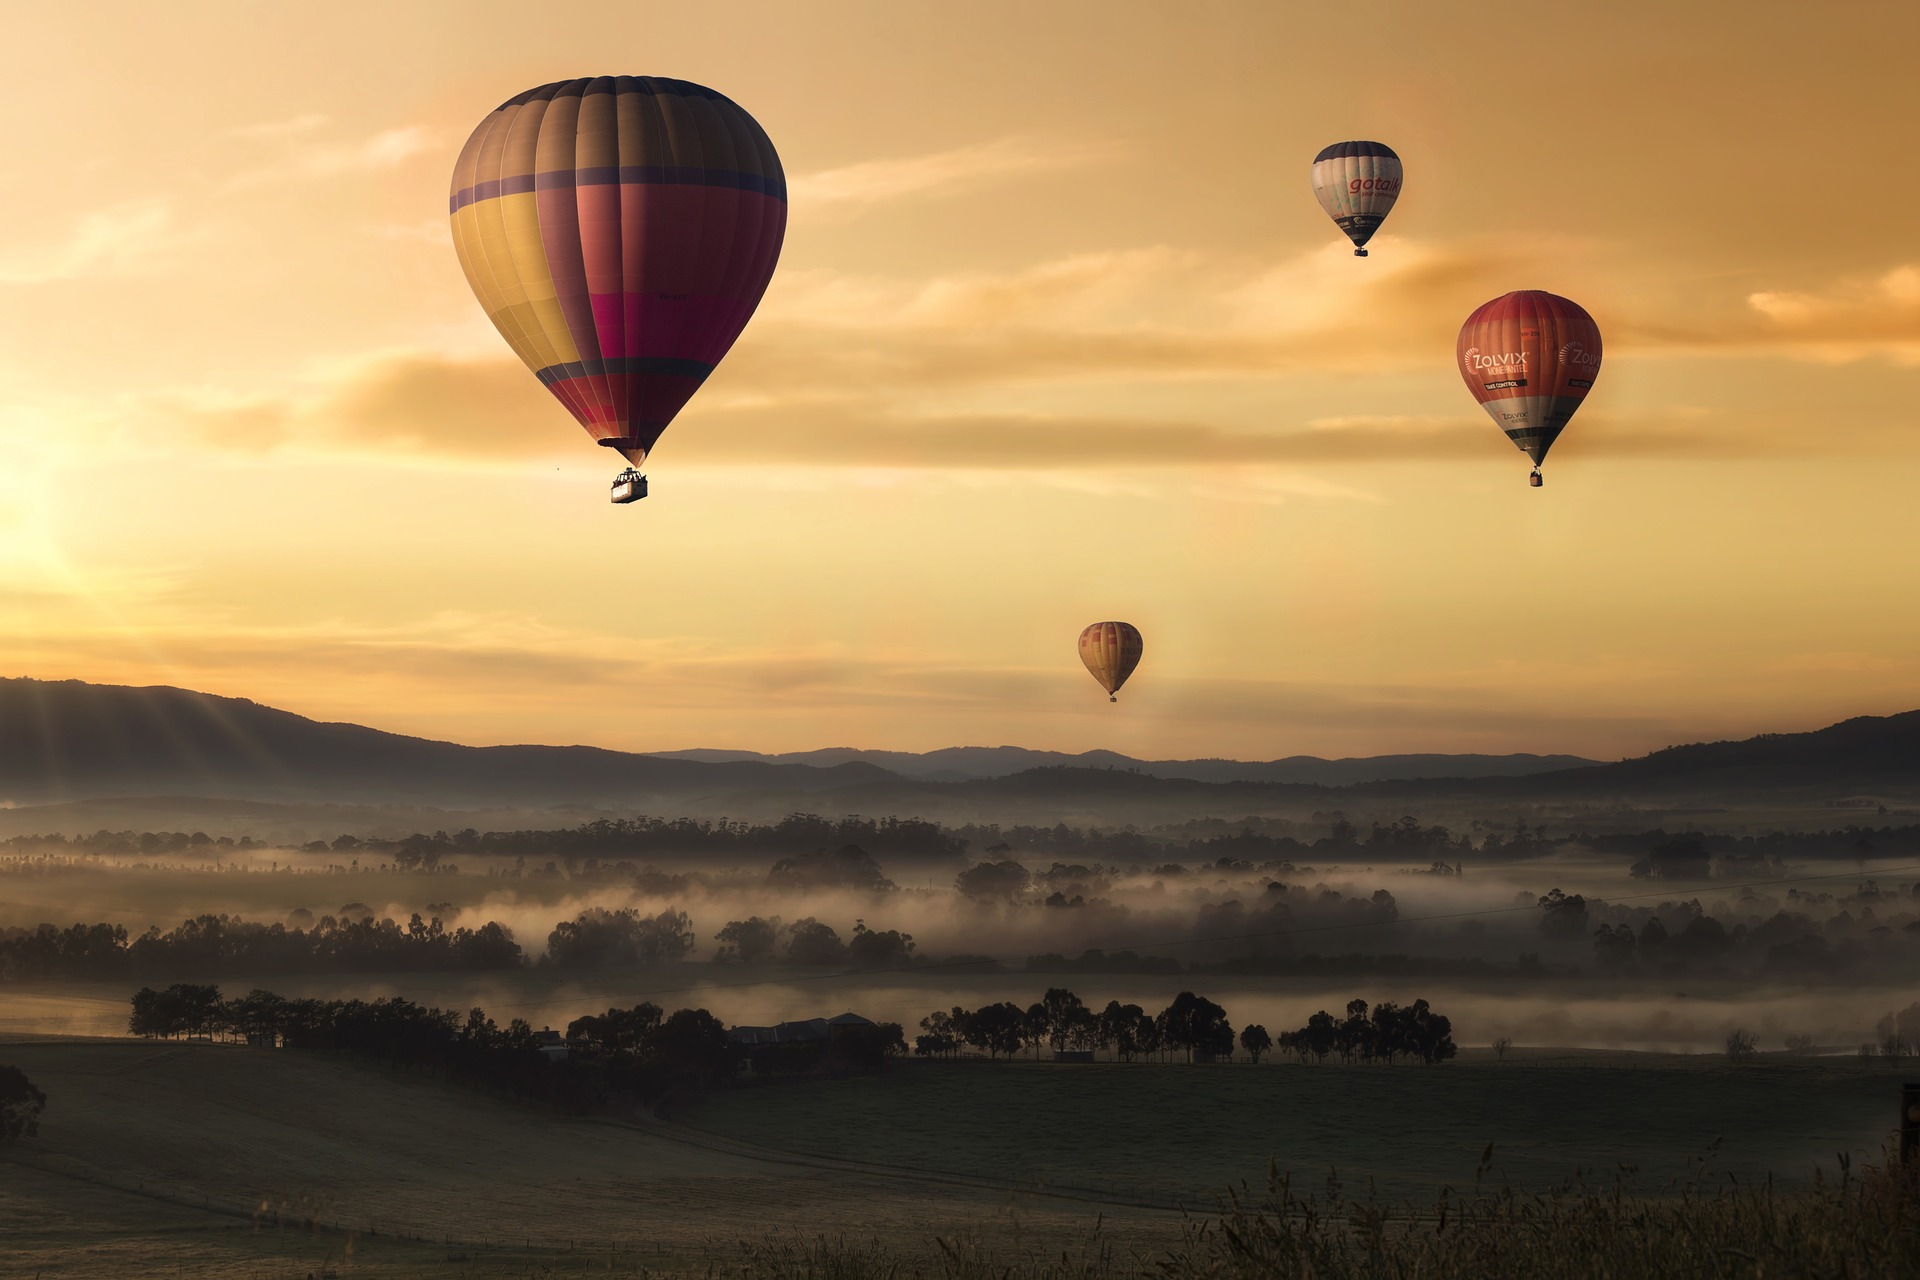 Ballon, Tal, Himmel, Float, Gelb, Nebel - Wallpaper - Professor-falken.com